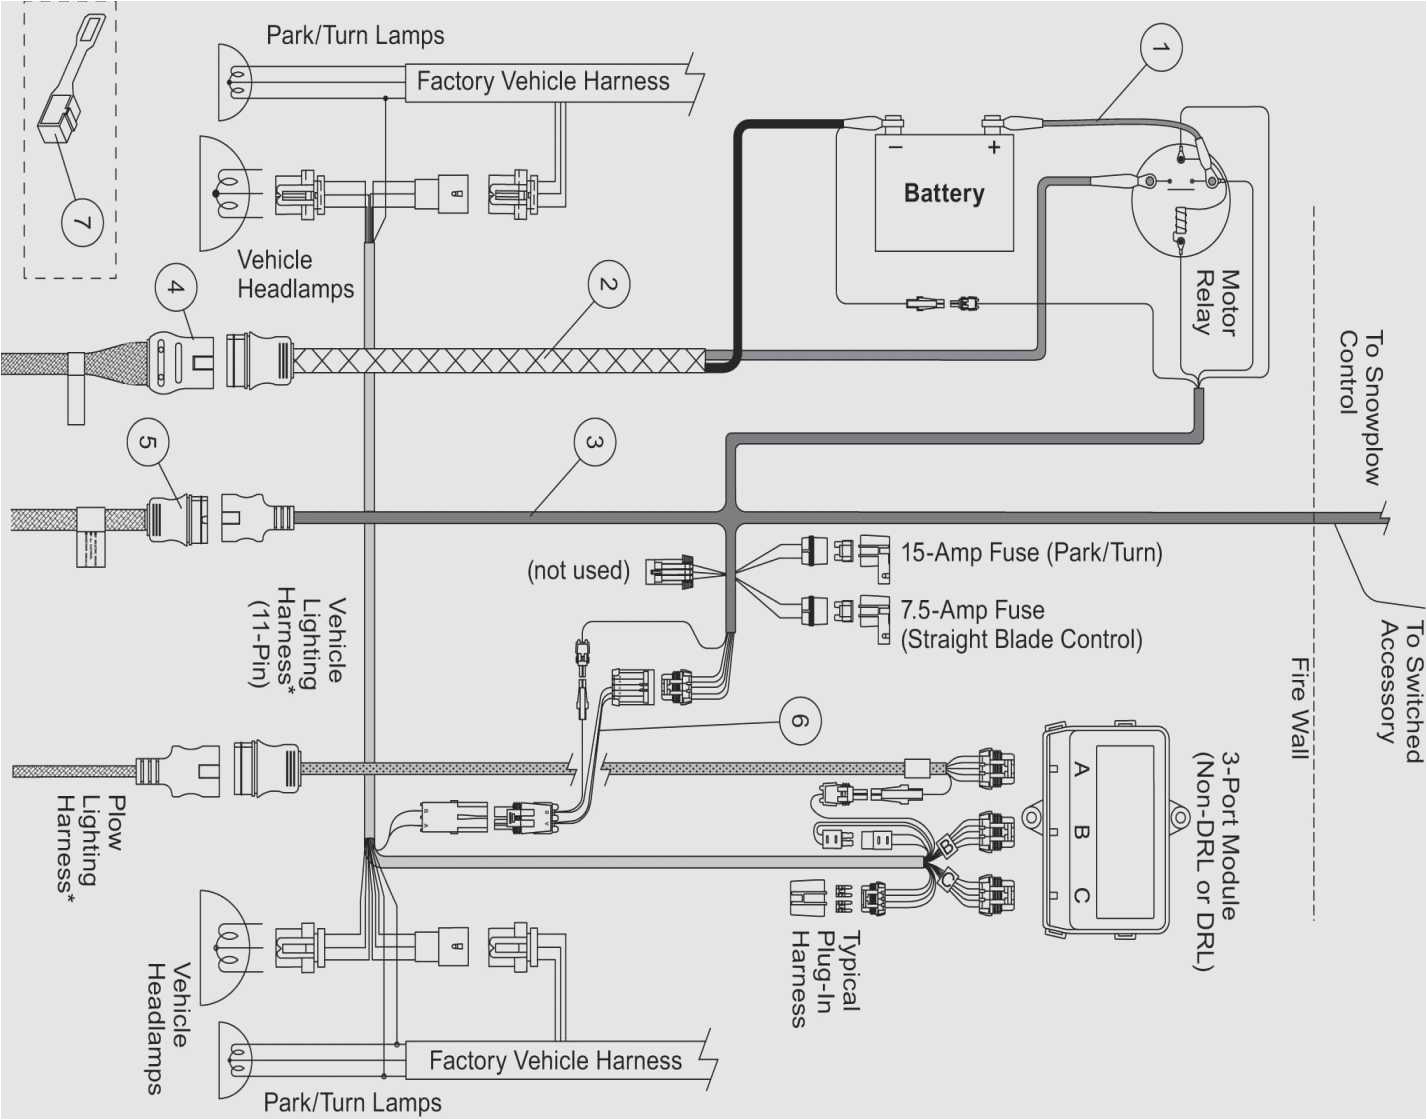 Boss Salt Spreader Wiring Diagram Diagram Boss Wiring Bv9364nb Wiring Diagram